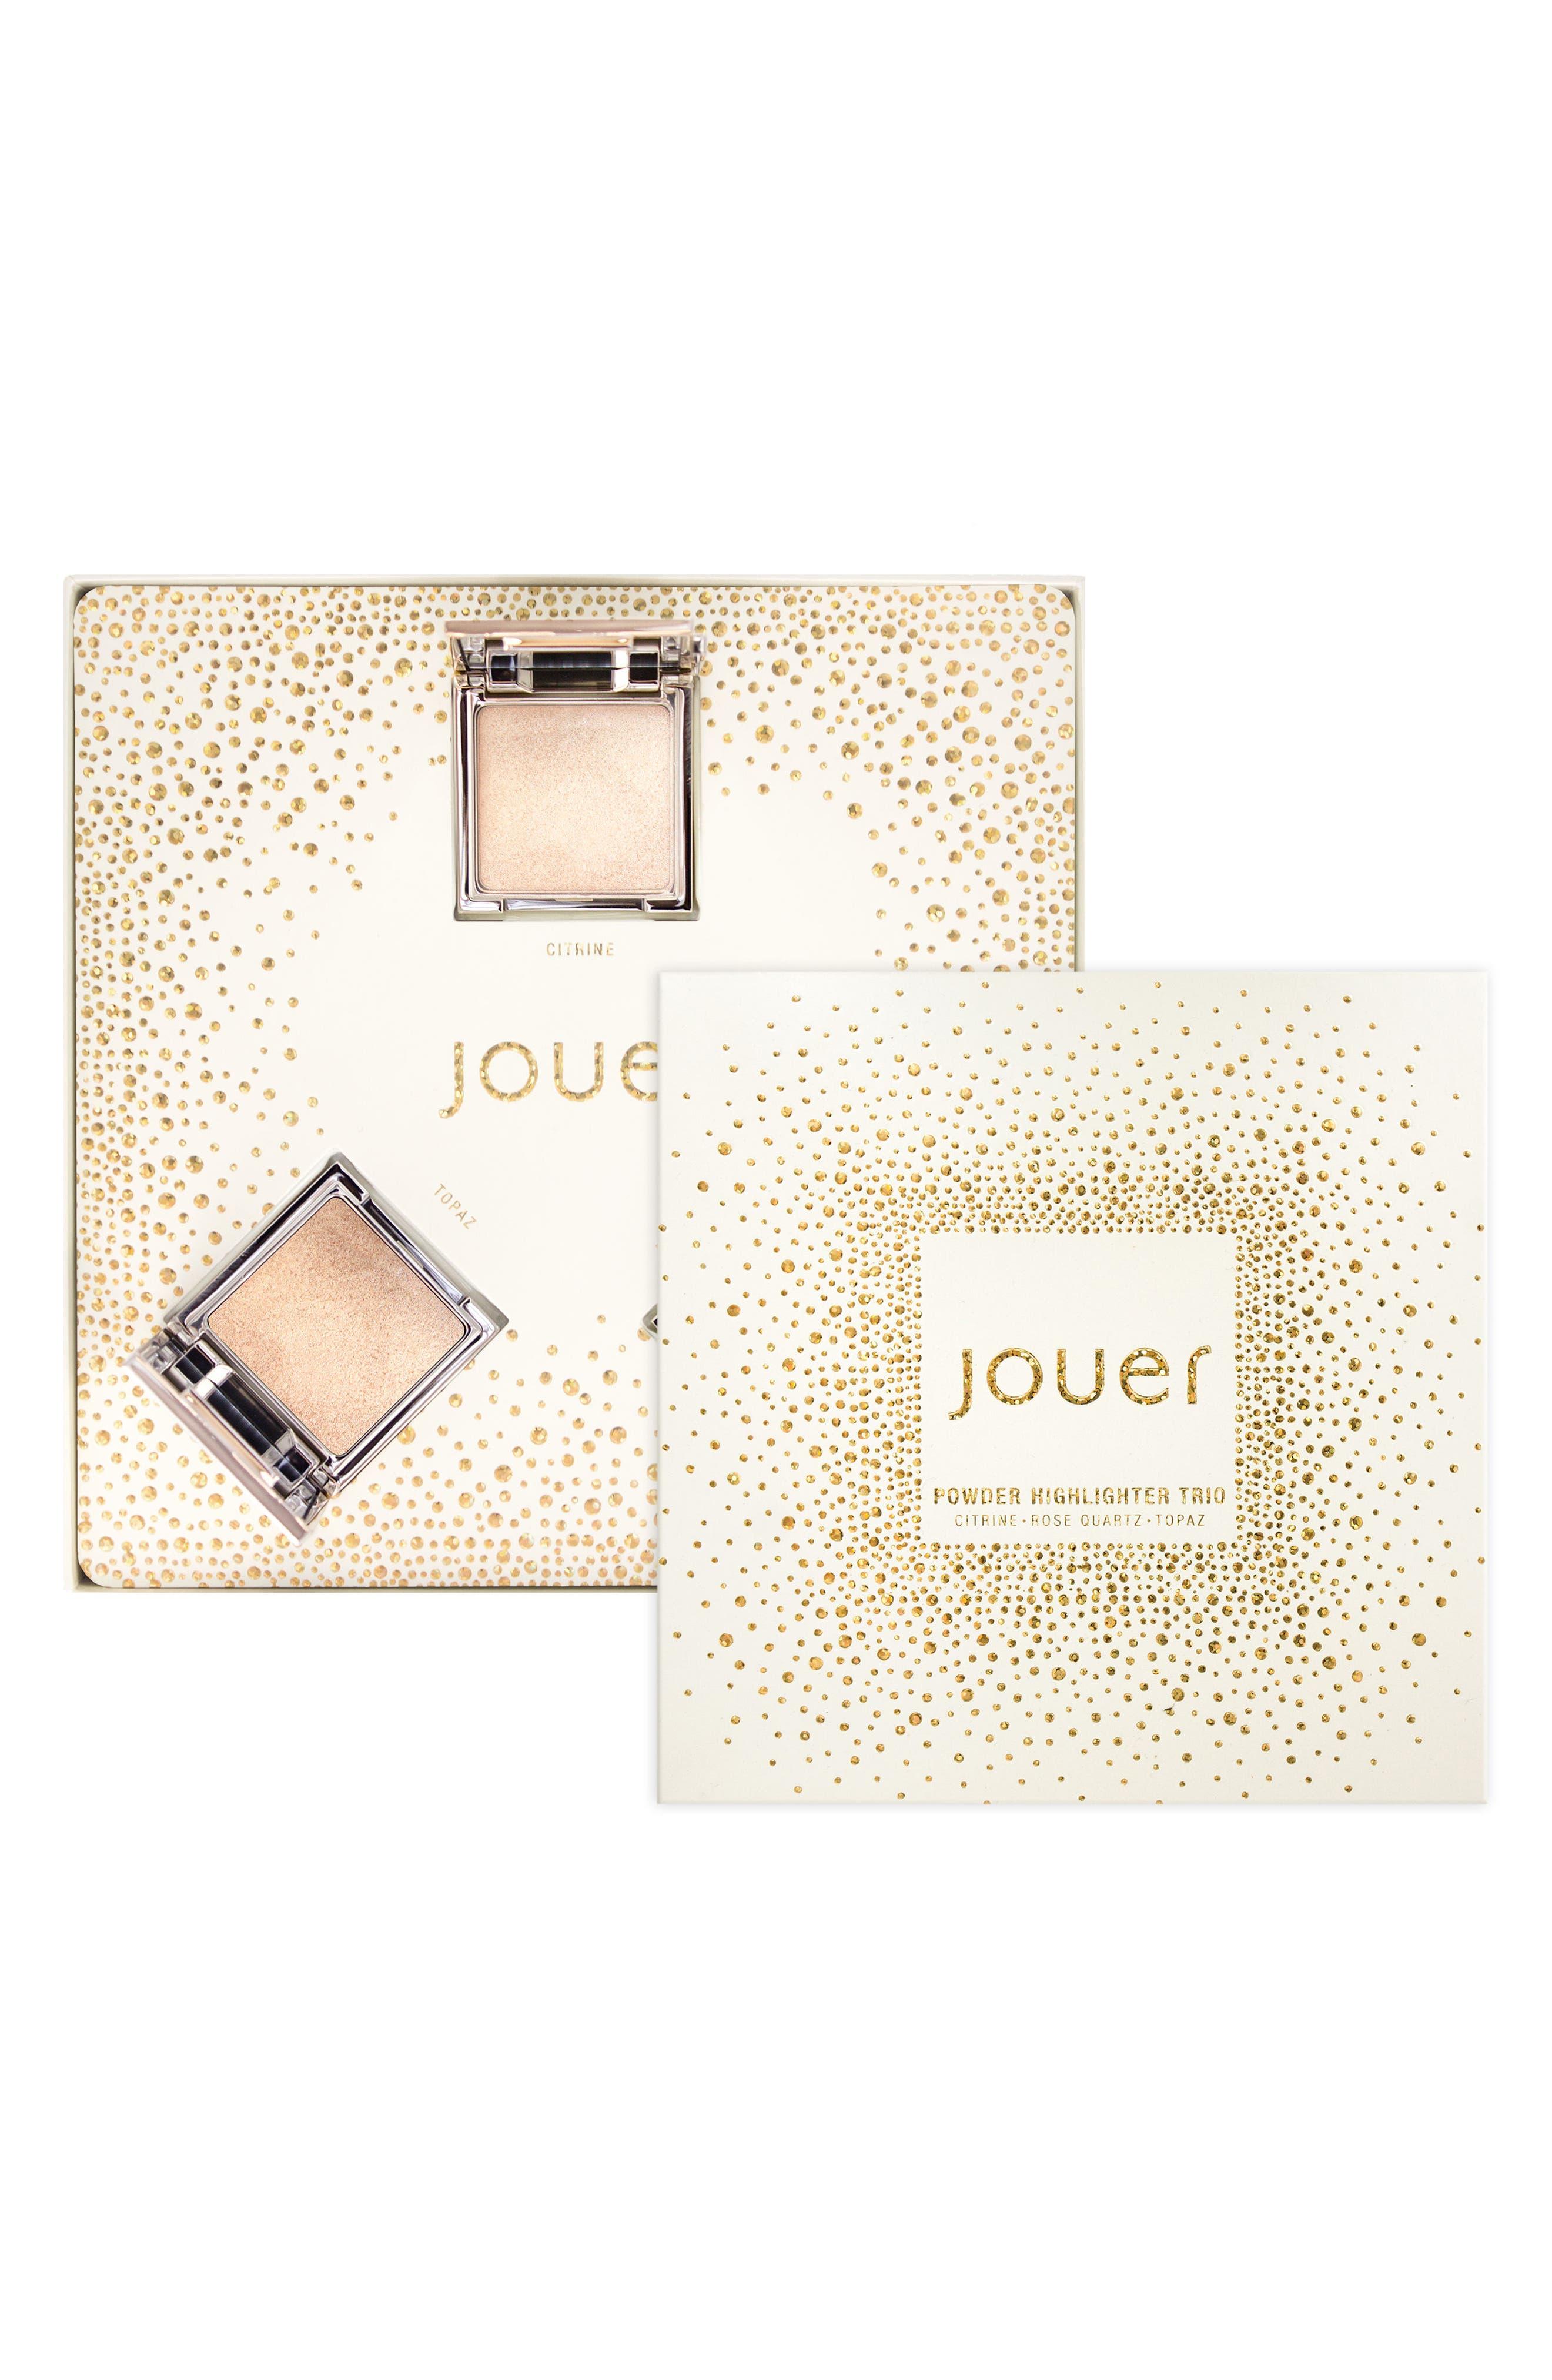 Jouer Skinny Dip, Peach & Rose Gold Powder Highlighter Trio ($60 Value)